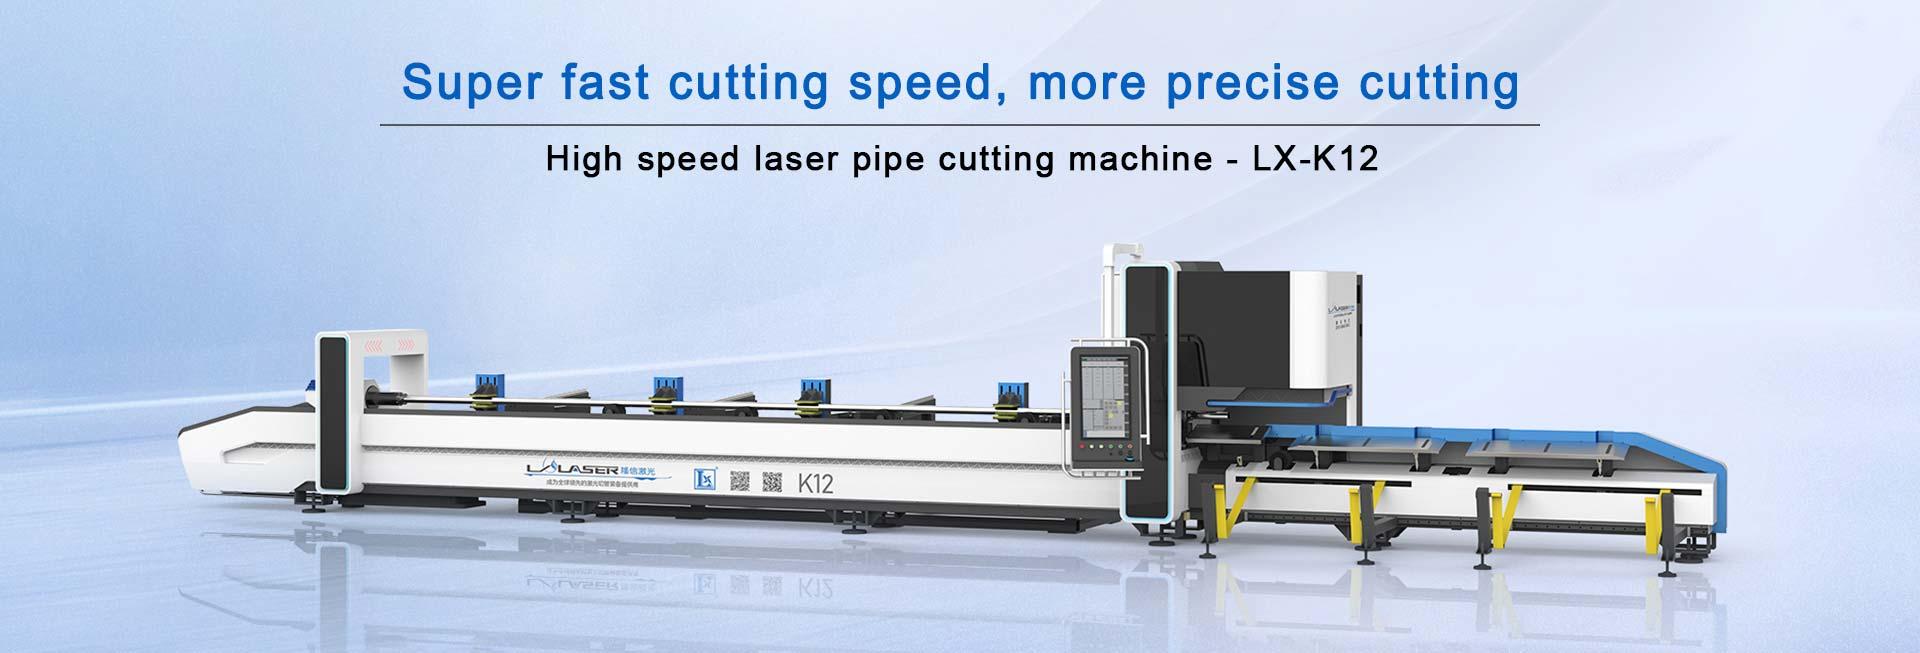 High speed laser pipe cutting machine K12